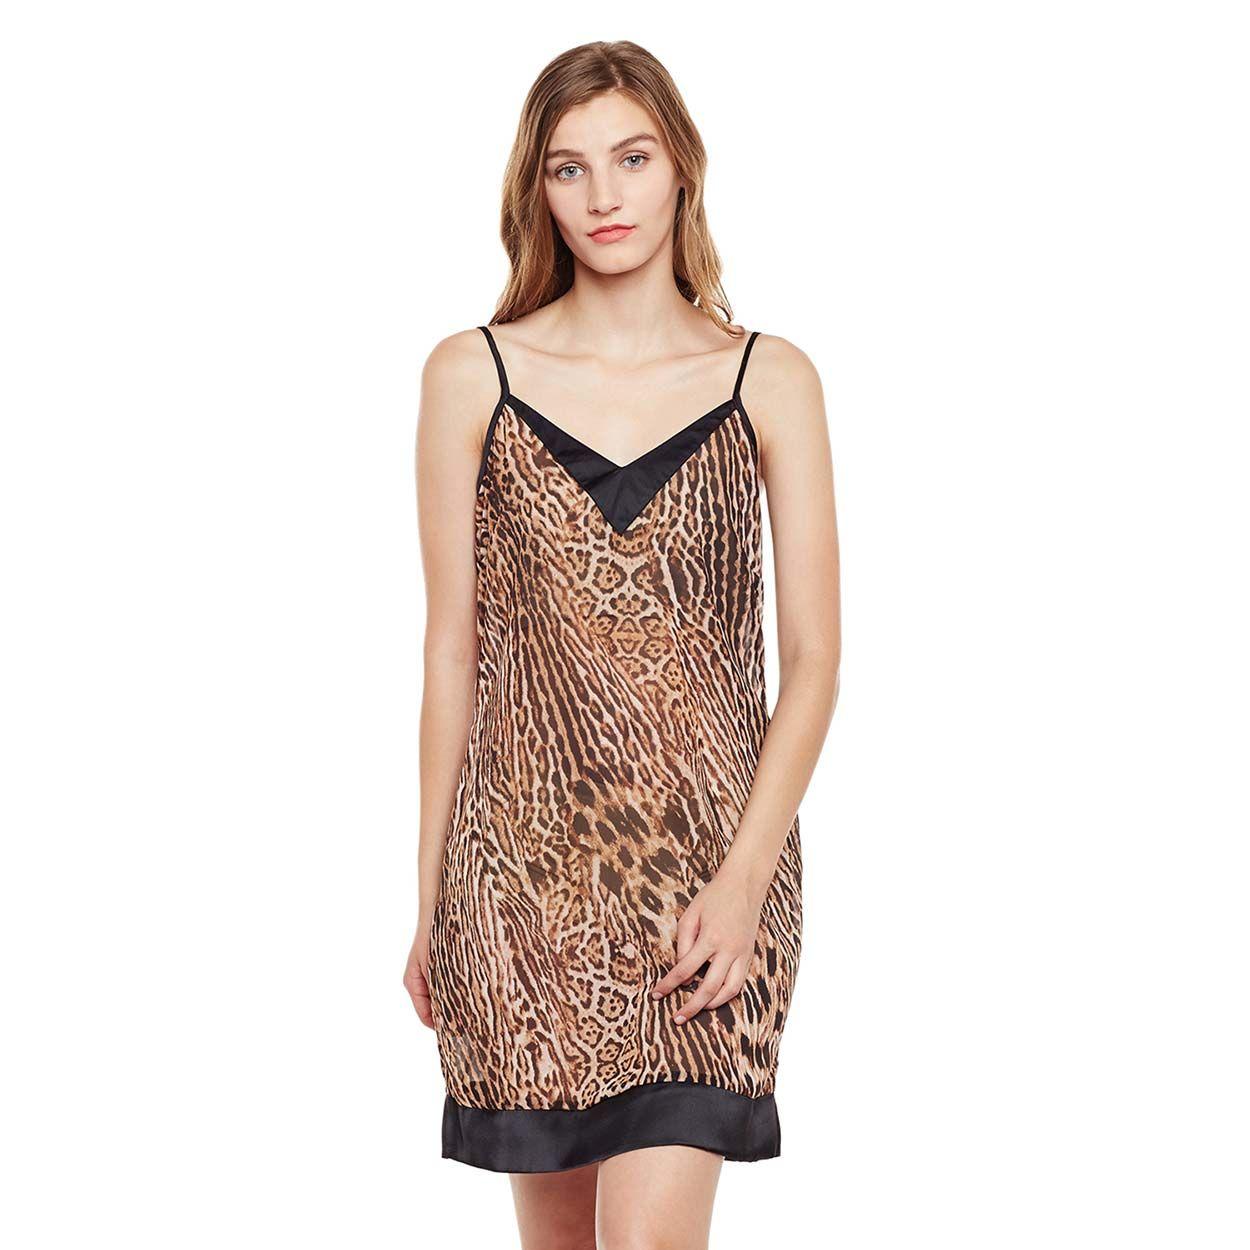 Home · Animal Print Night Dress. sold-out-image zoom Animal ... 18f5ba0f7